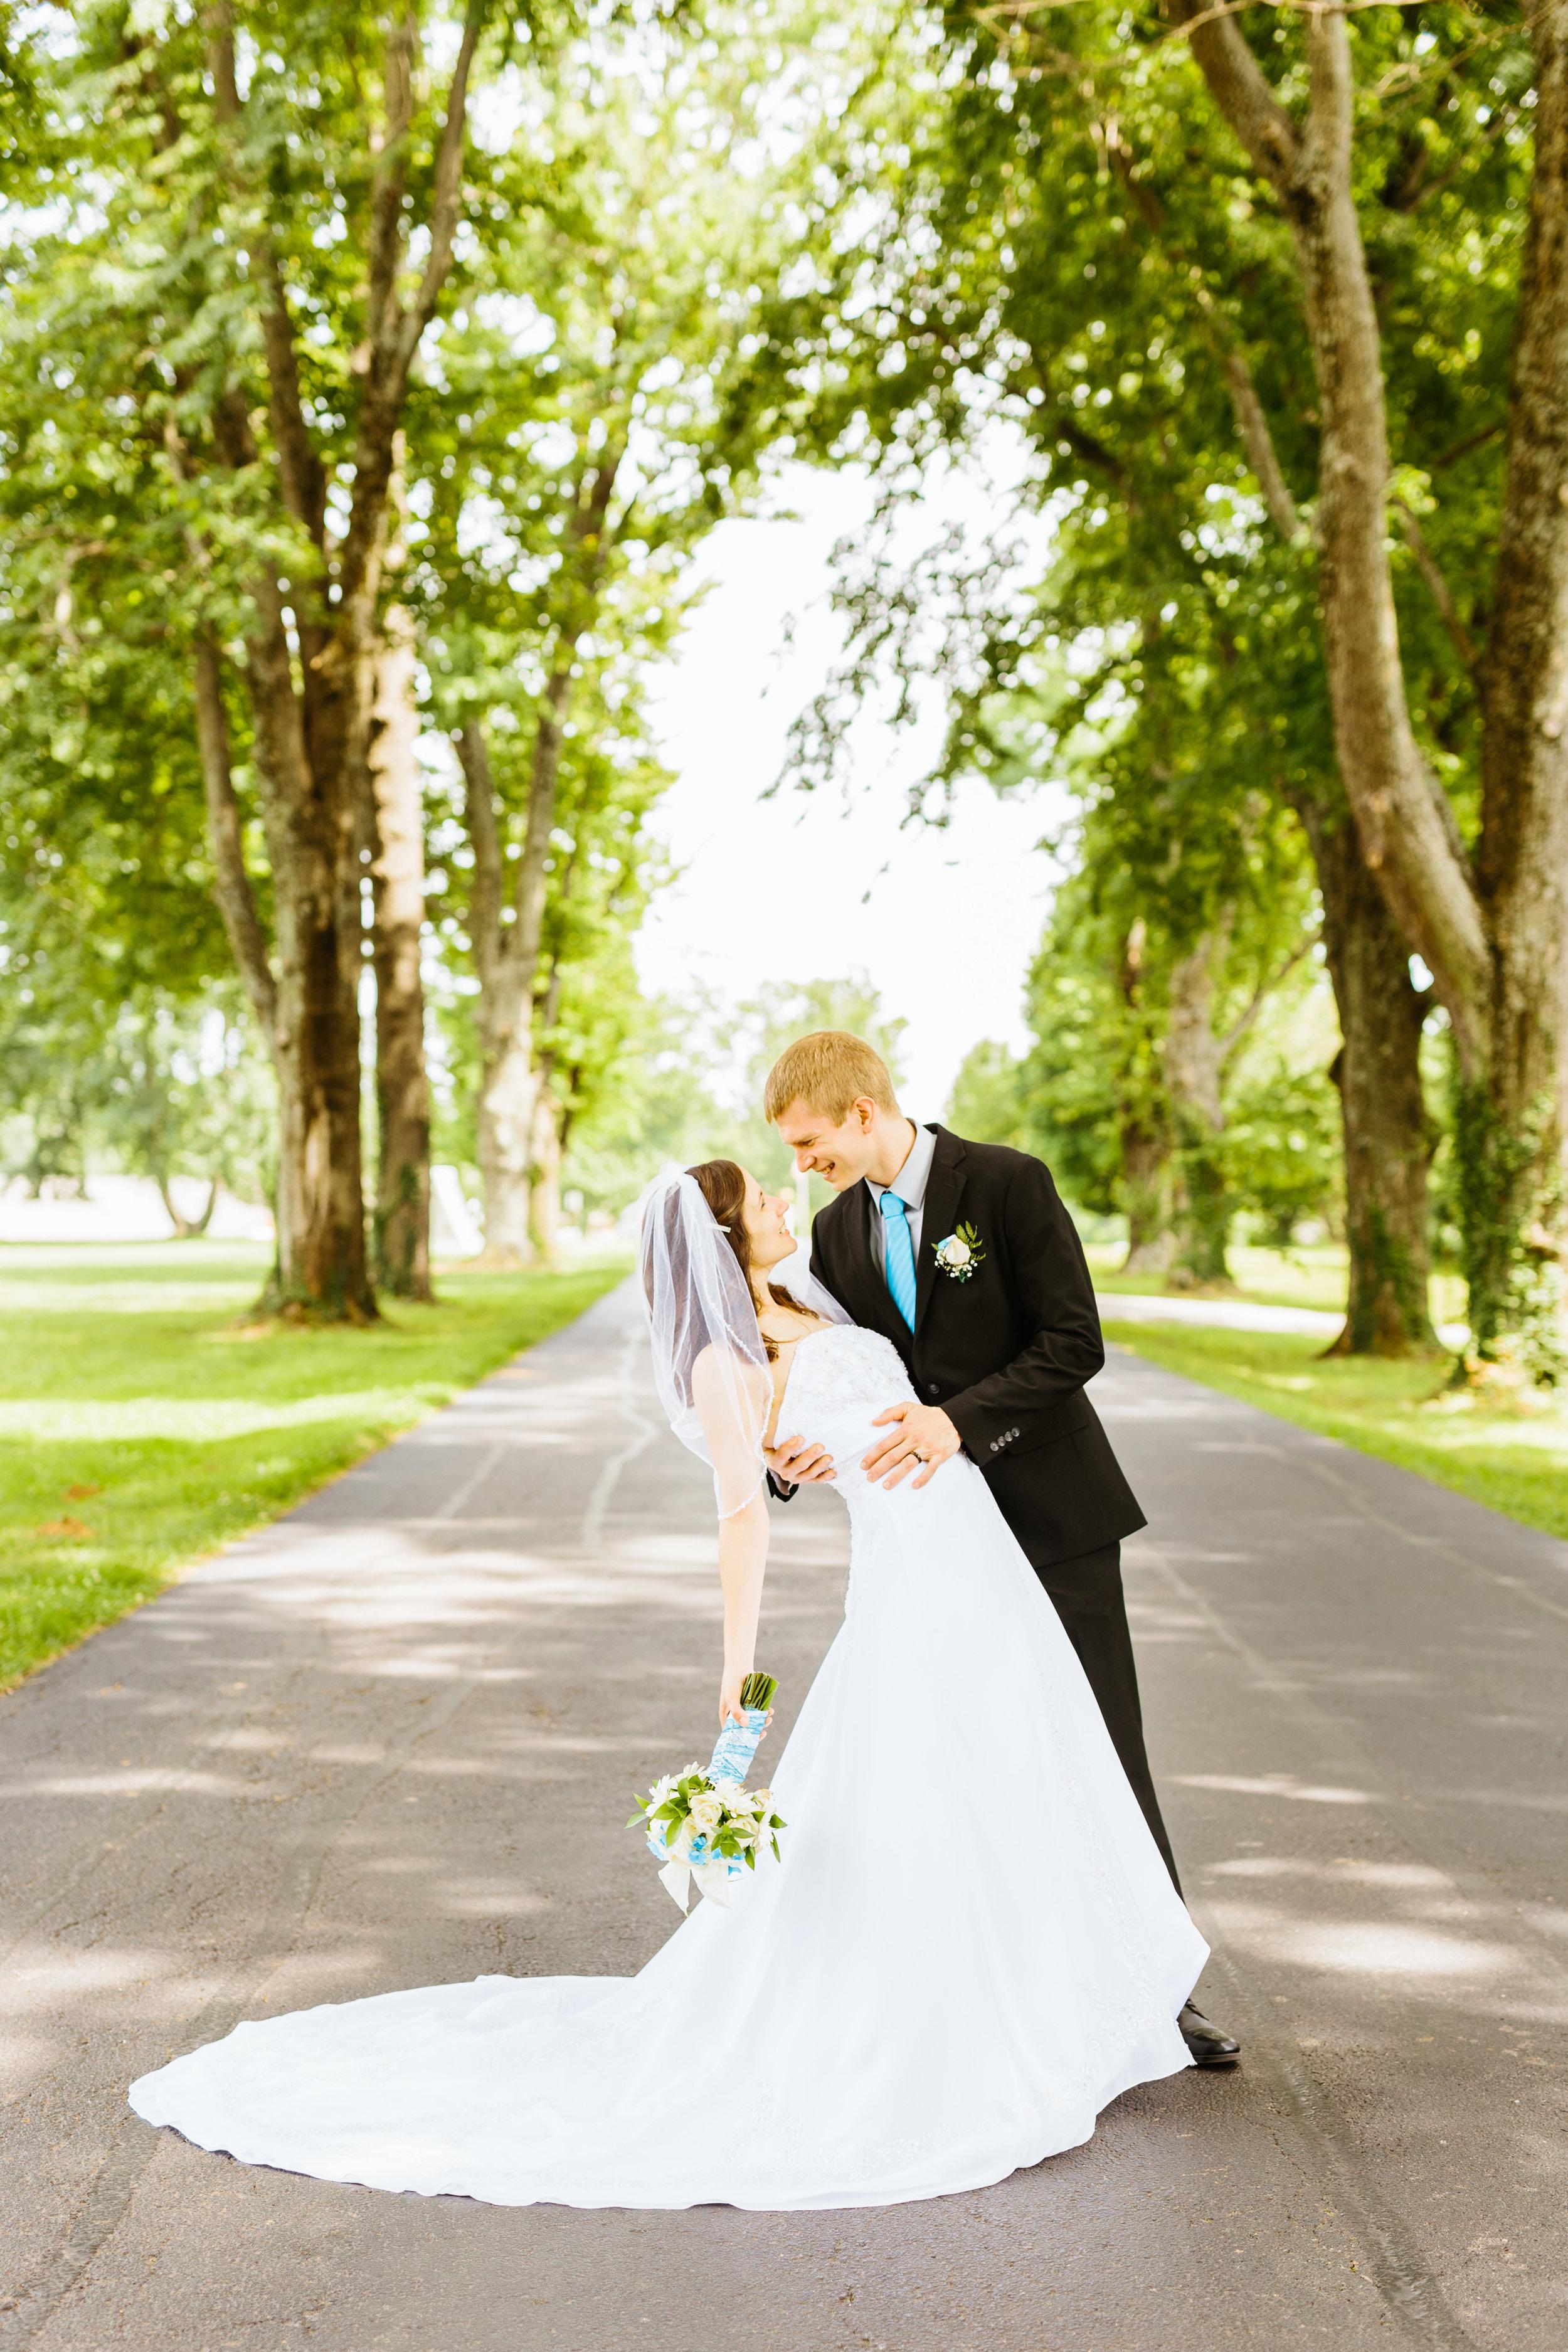 Teller-Payich Wedding-482.jpg